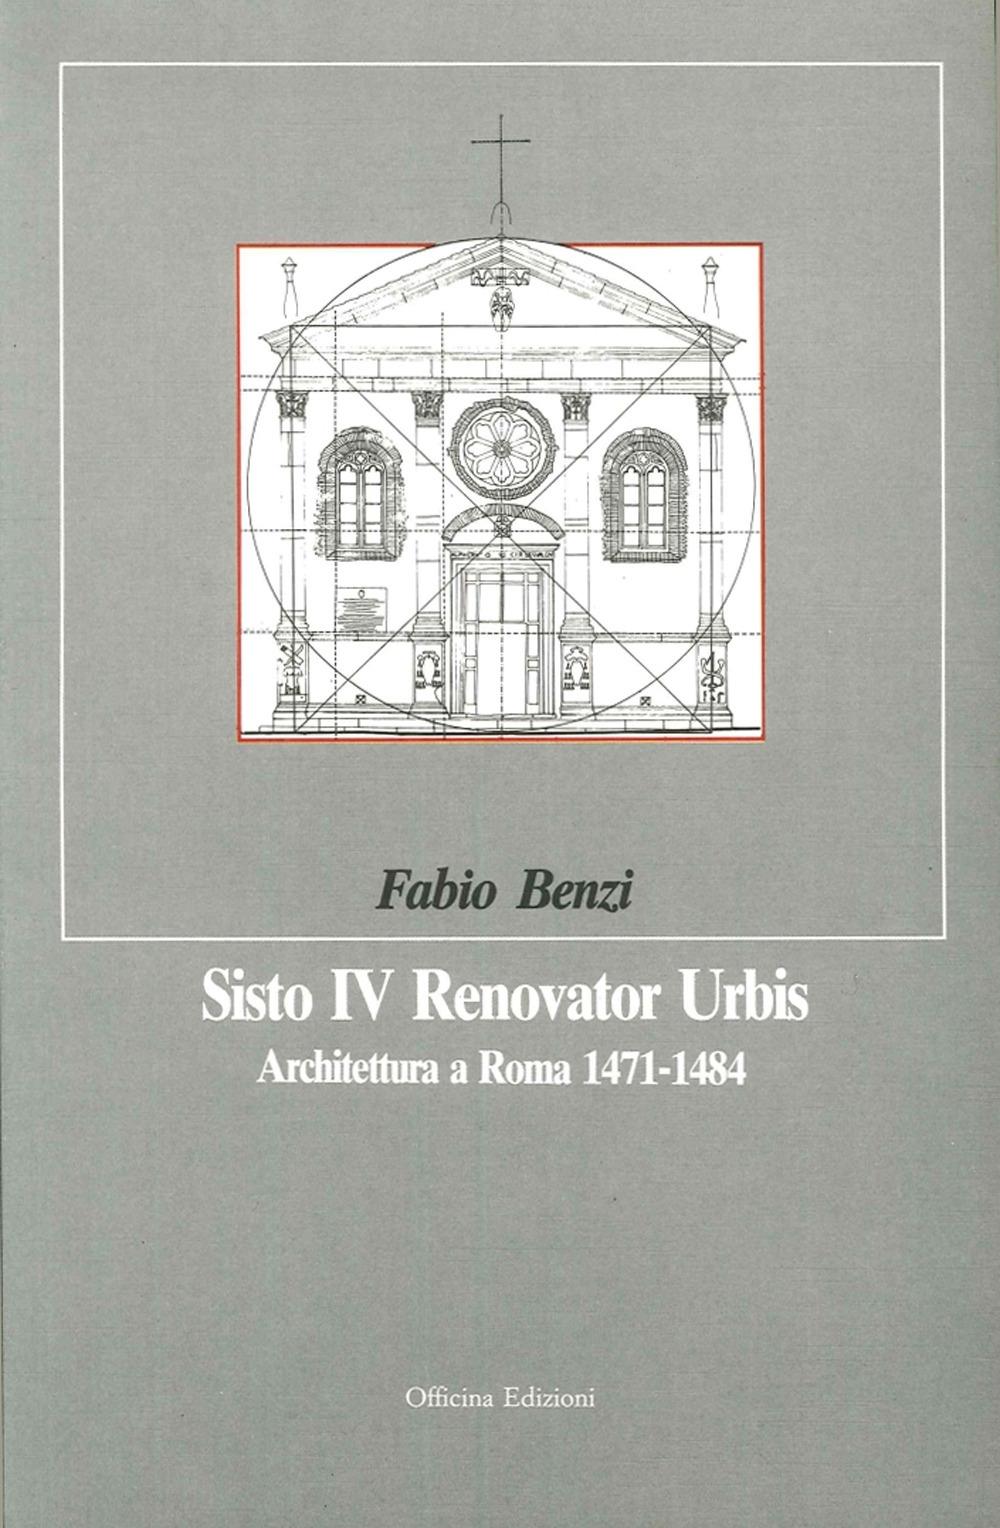 Sisto IV, Renovator Urbis. Architettura a Roma, 1471-1484.